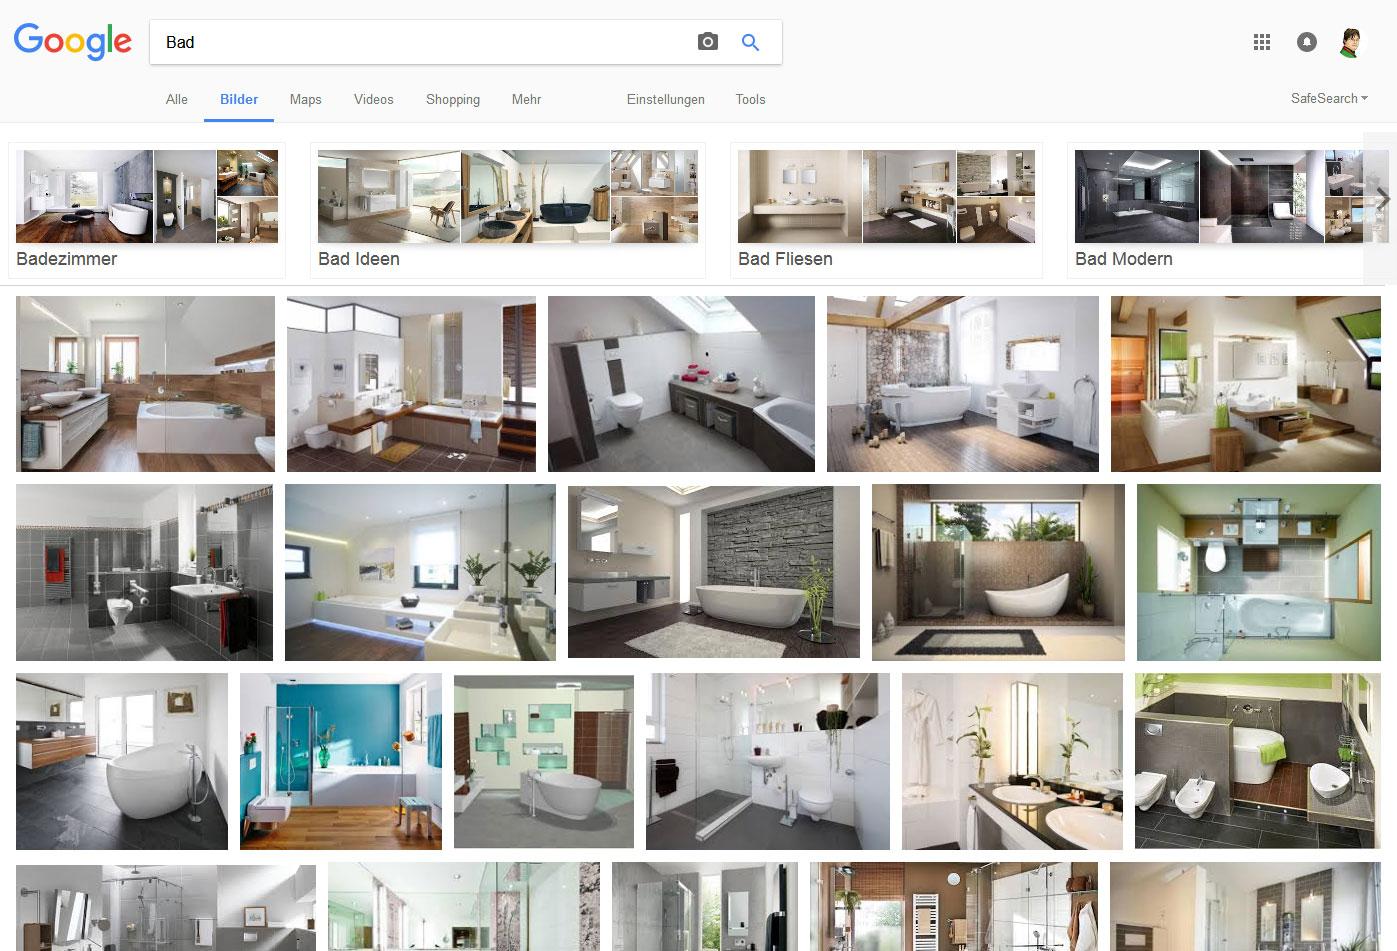 Google-Bildersuche: Bad